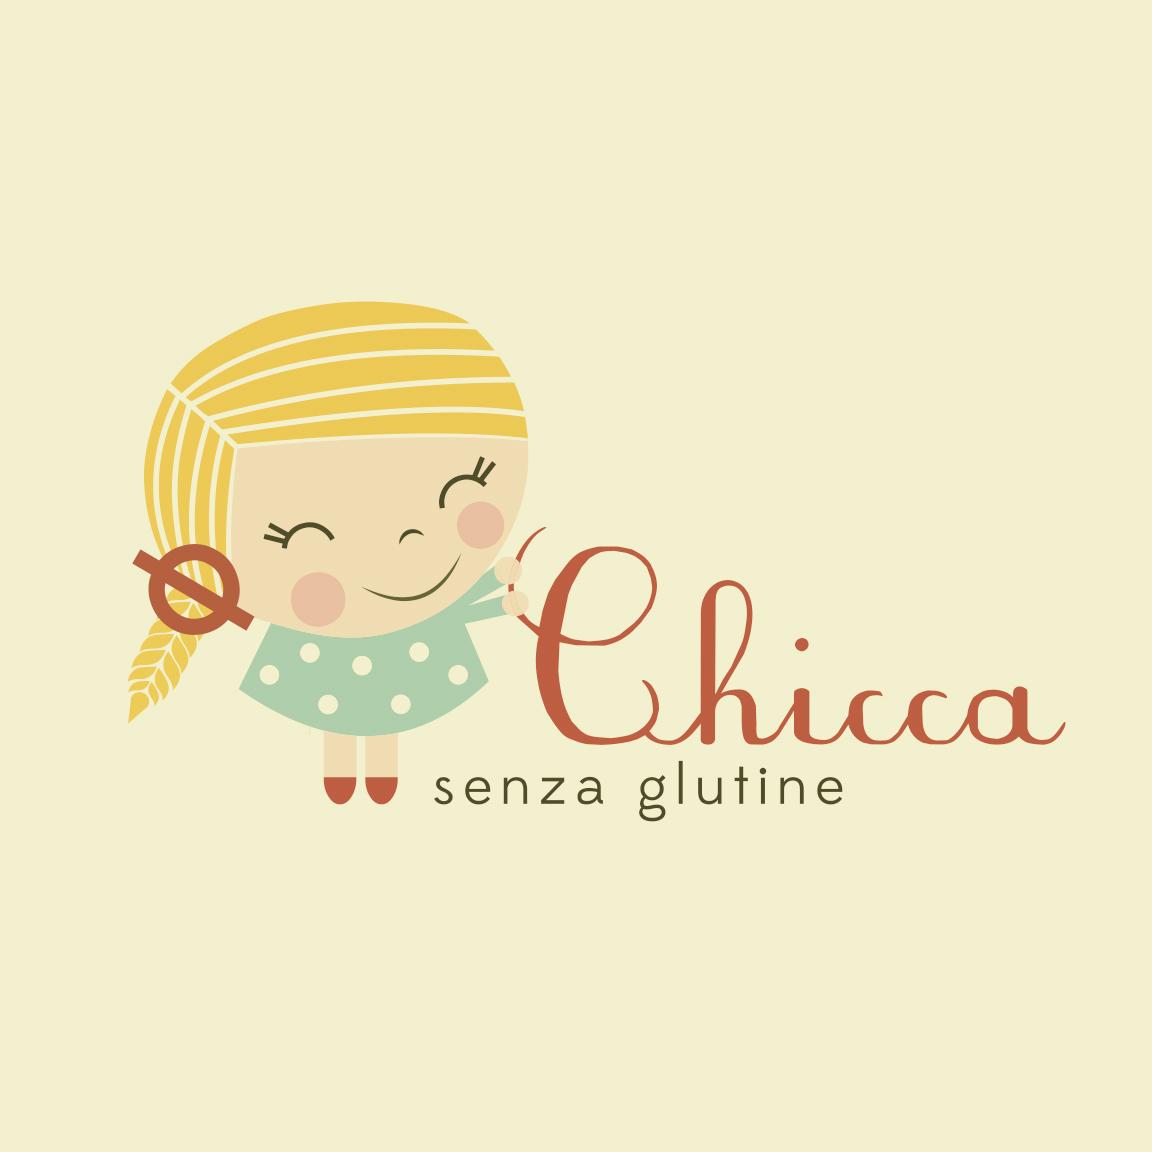 chicca_logo_base copia